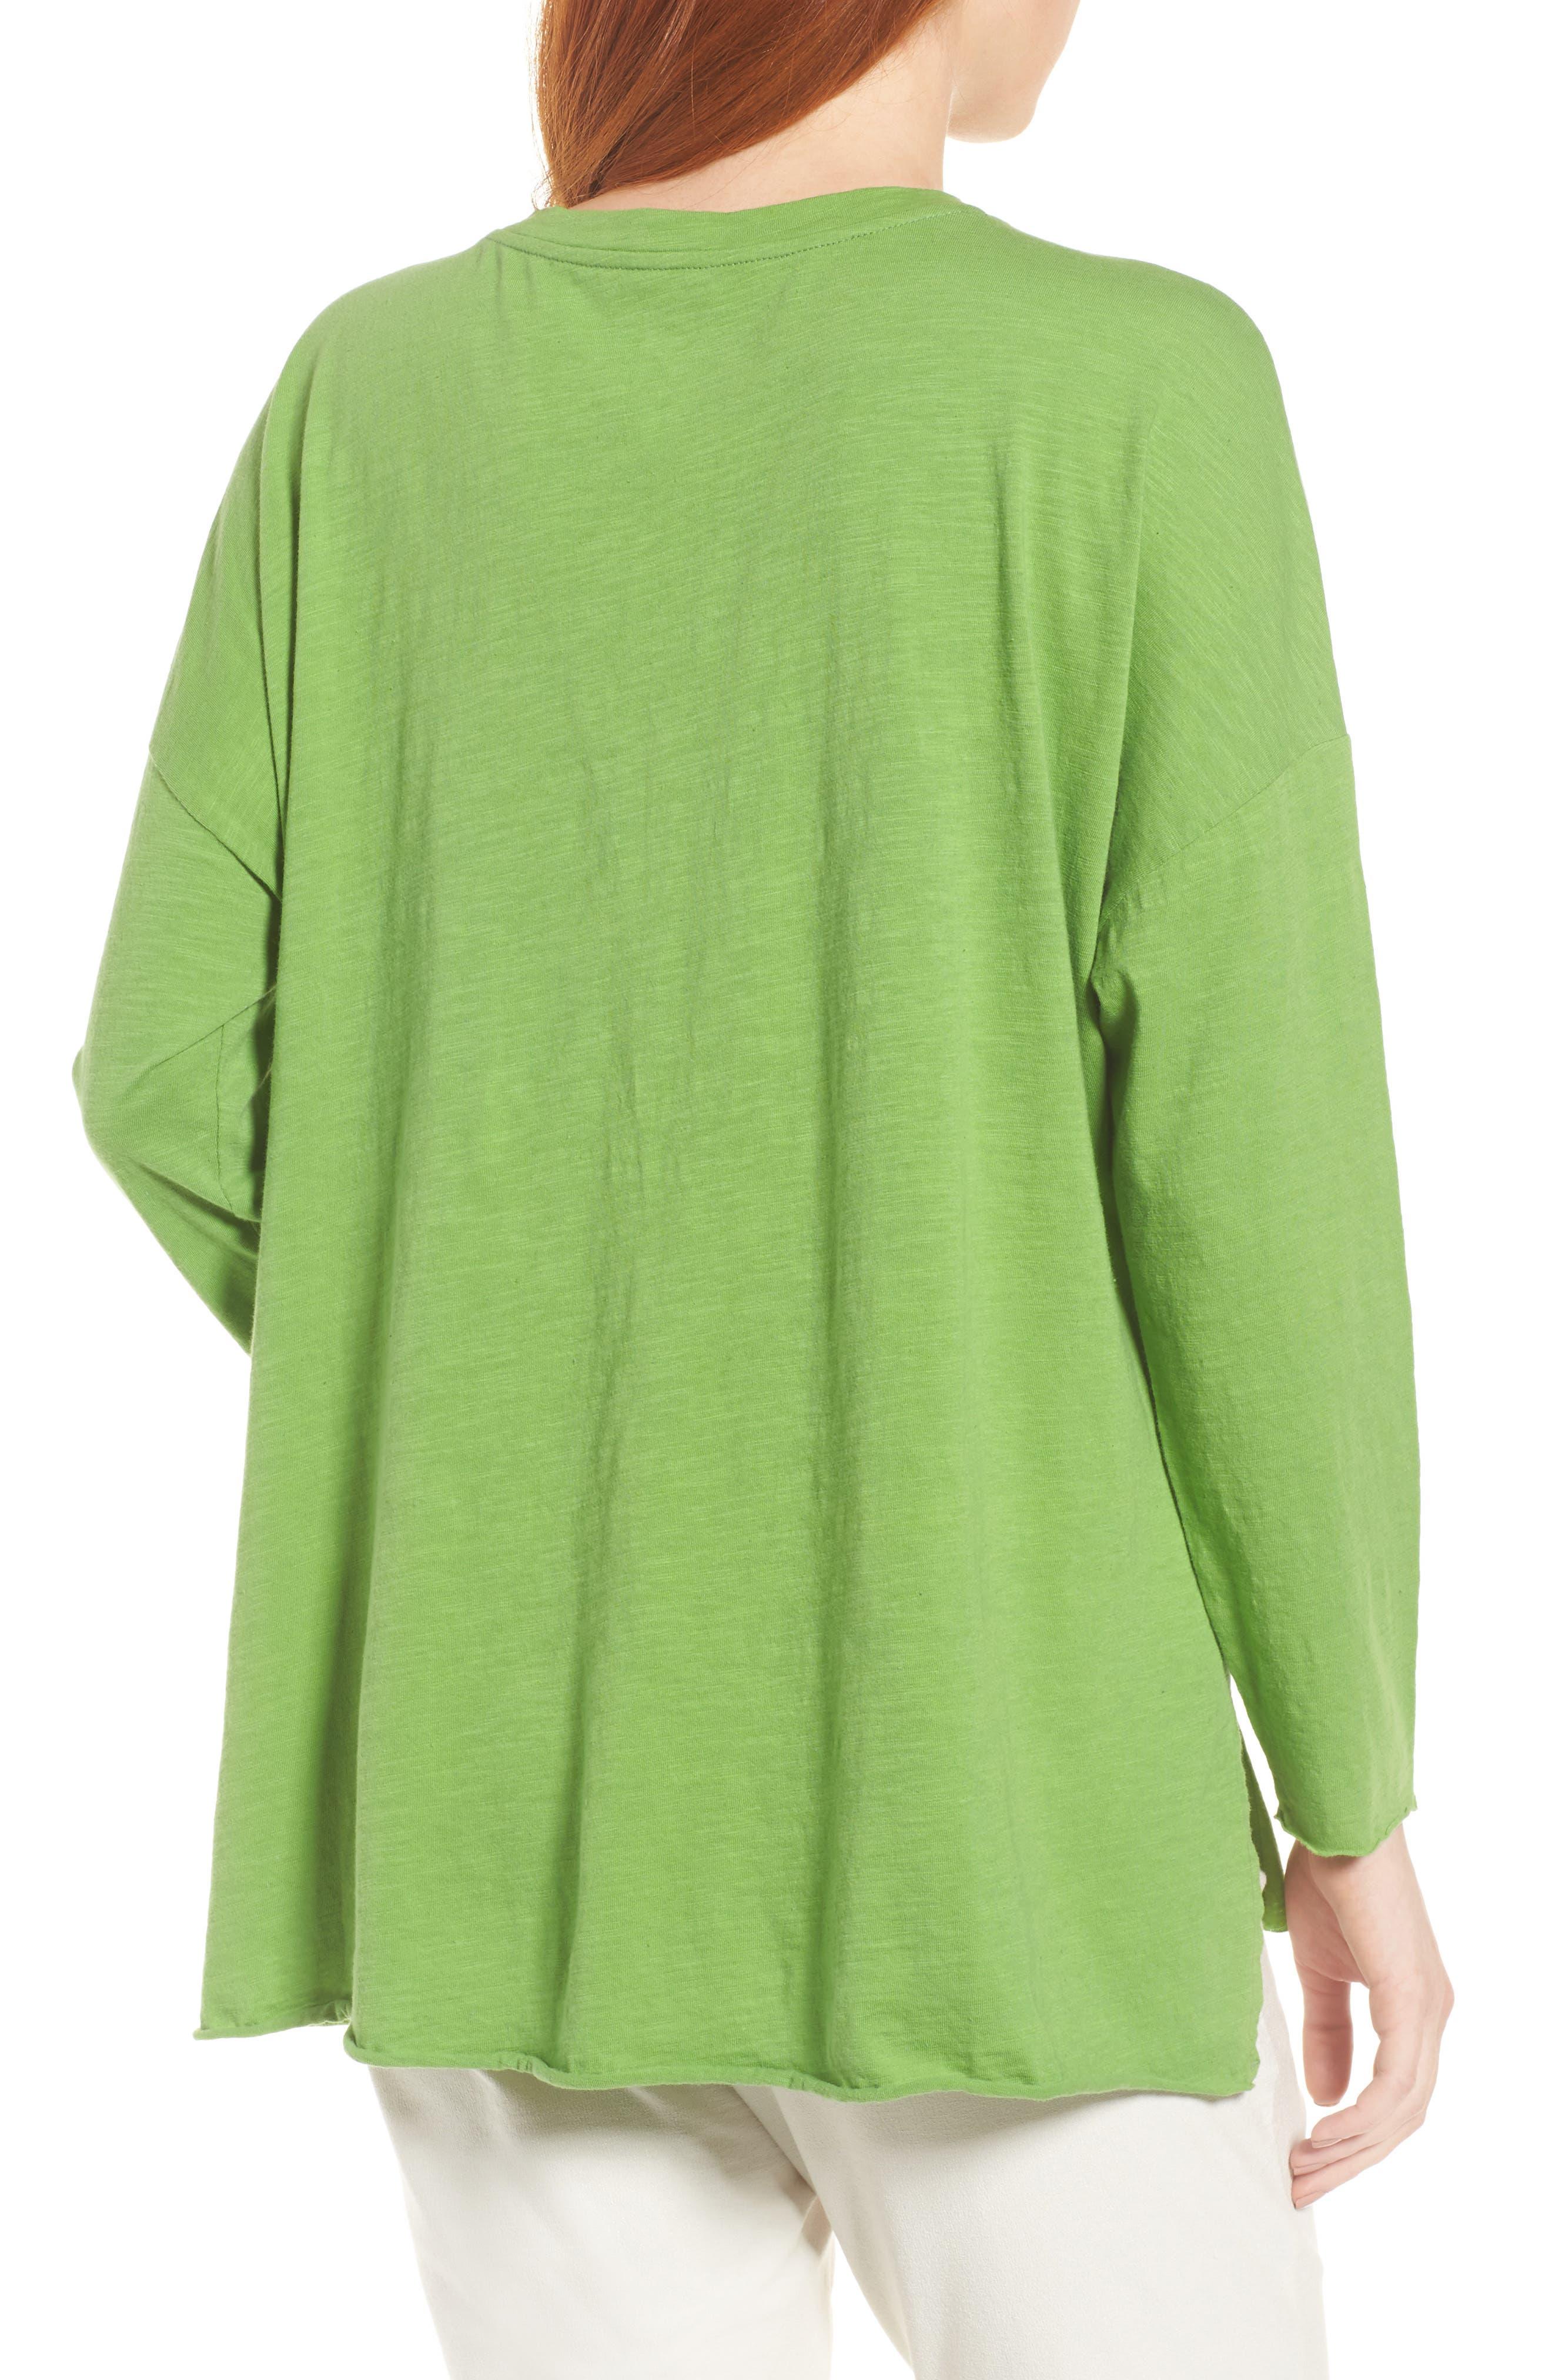 Organic Cotton Knit Top,                             Alternate thumbnail 12, color,